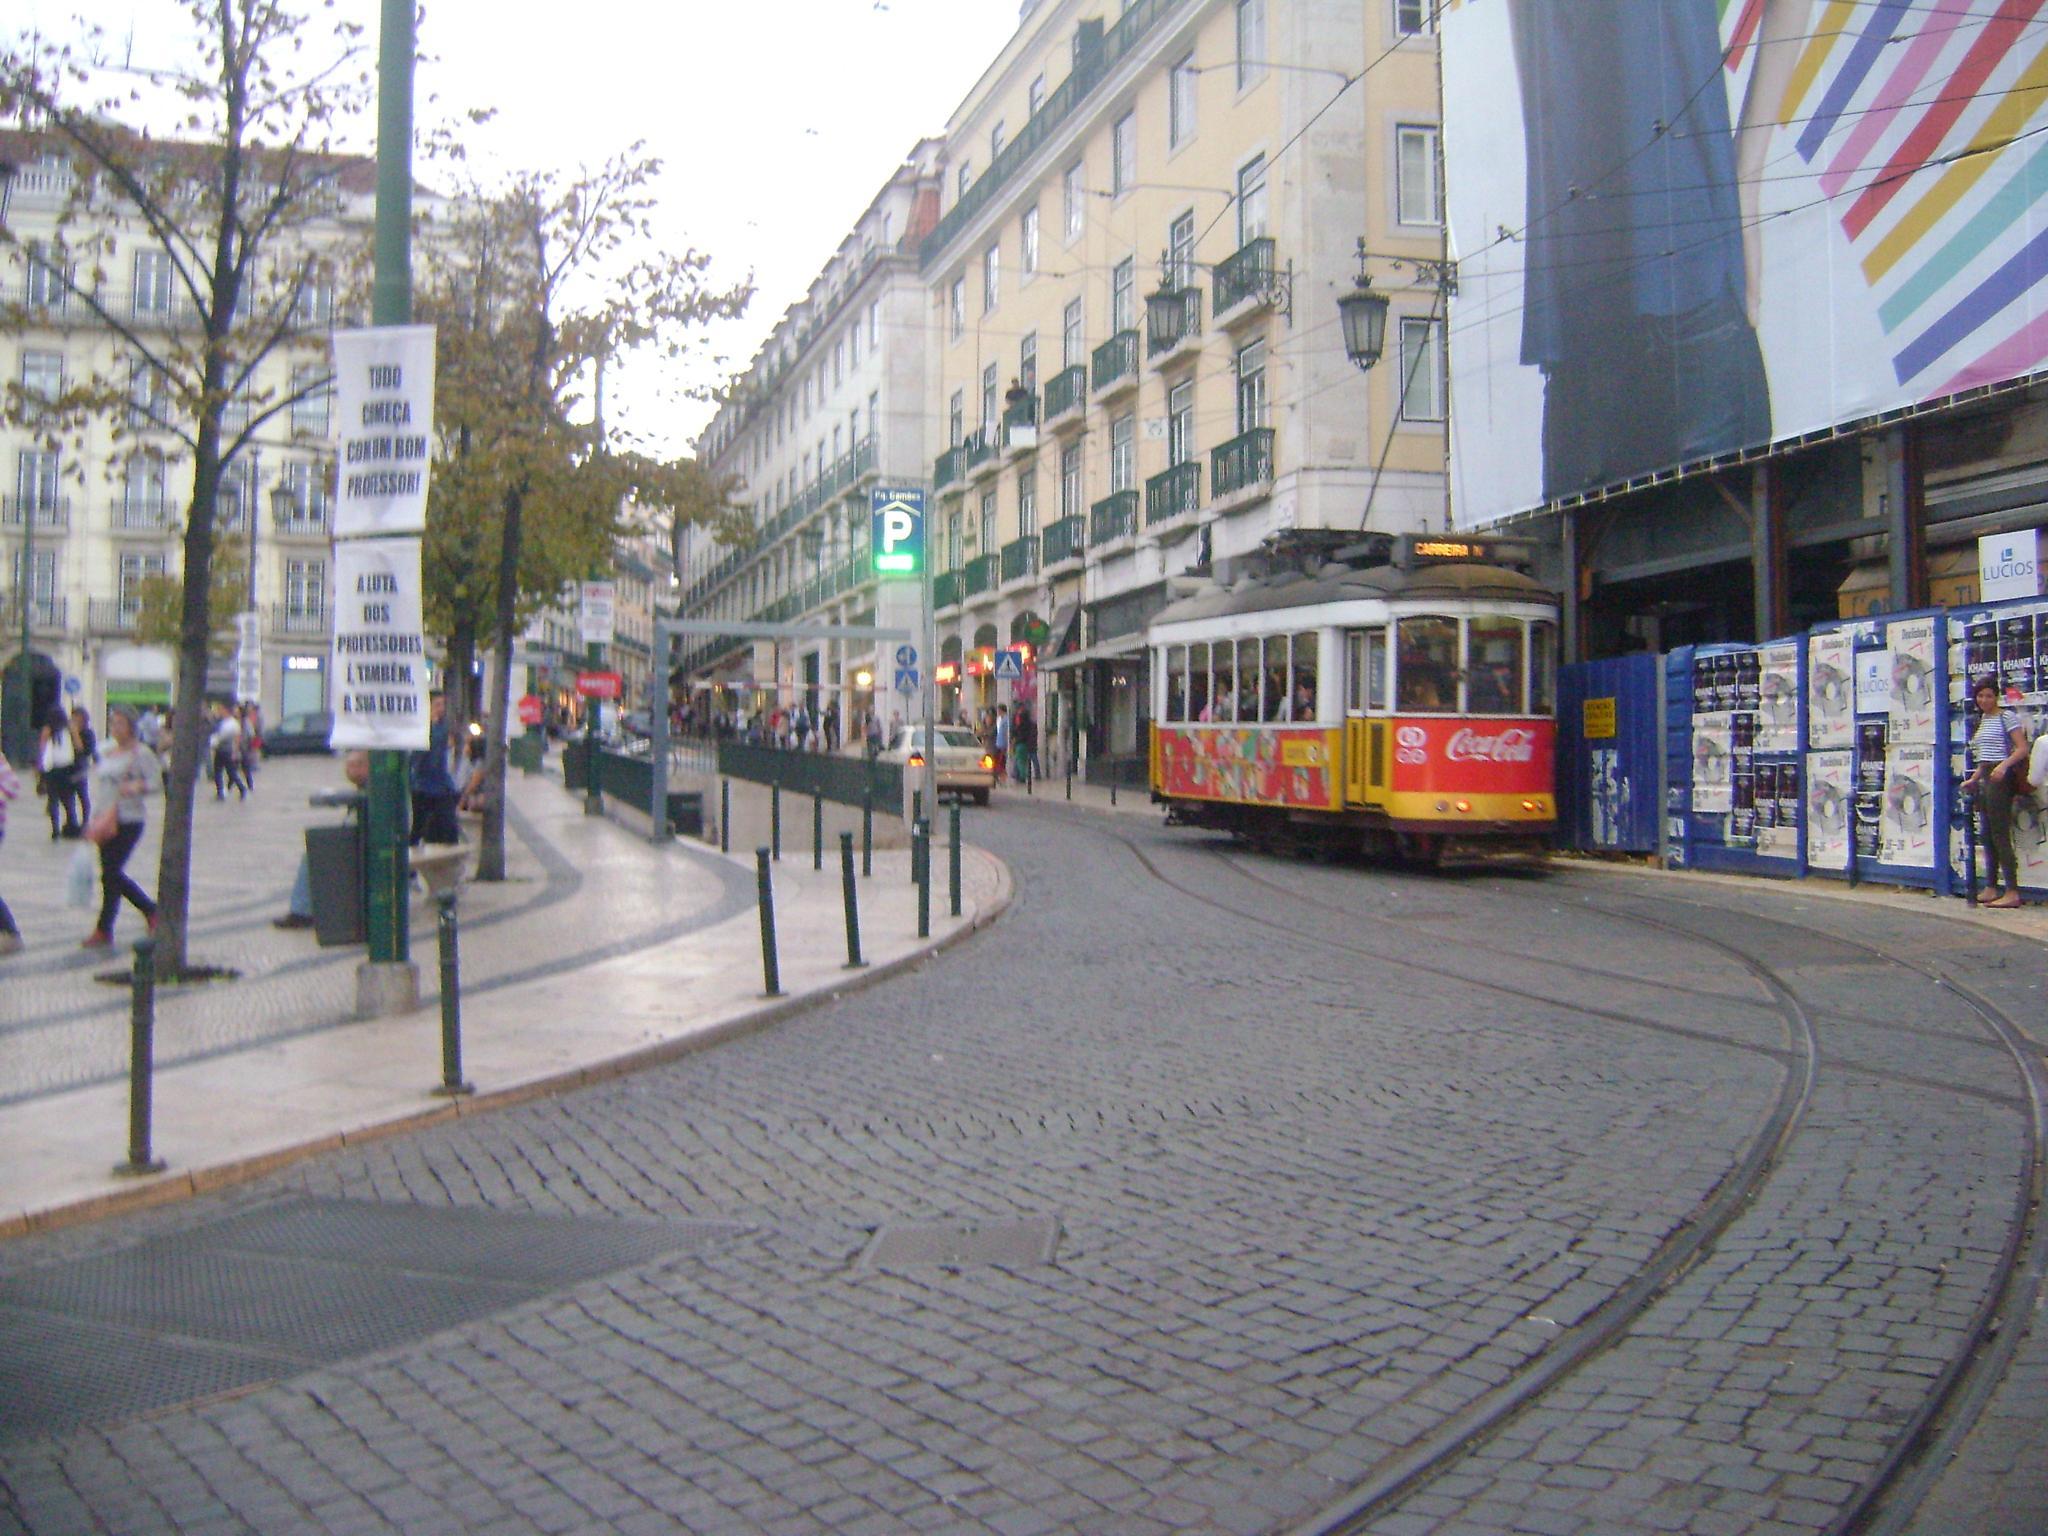 Lisboa Portugal by Lucyana Moreira